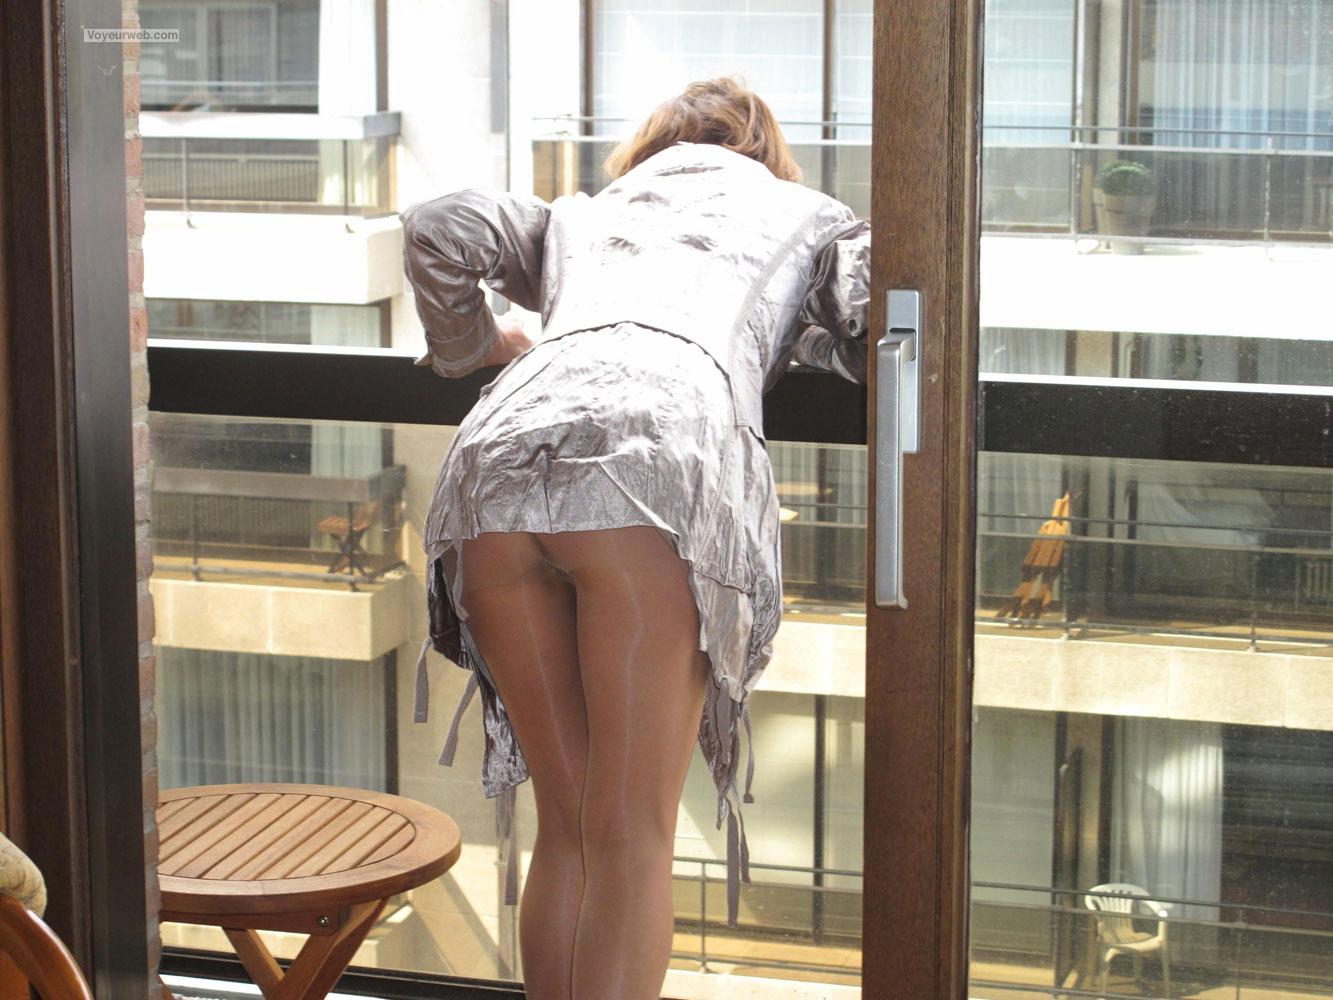 hot sexy bitch stripping gifs